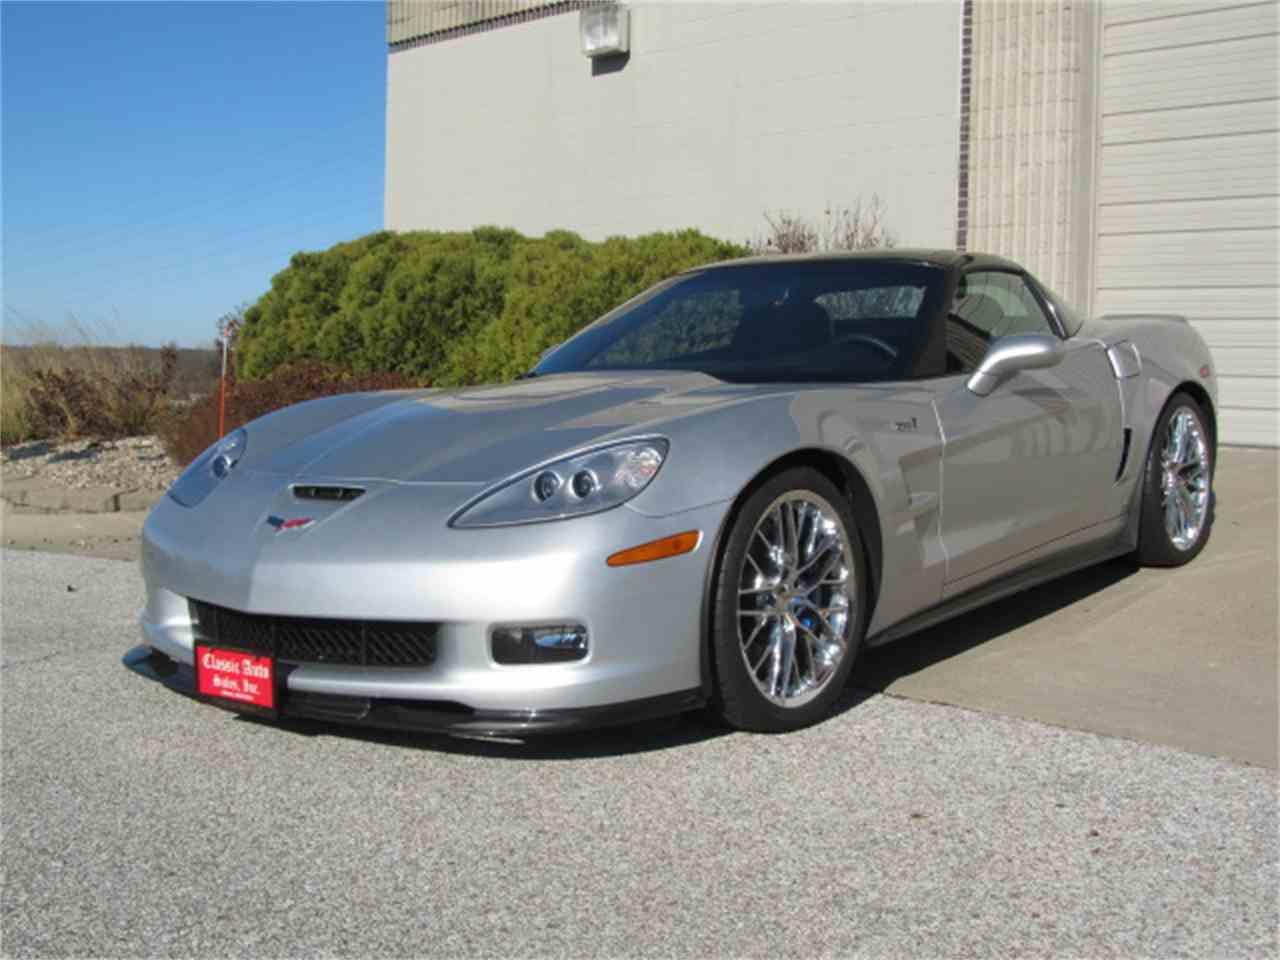 2009 chevrolet corvette zr1 for sale cc 1041852. Black Bedroom Furniture Sets. Home Design Ideas